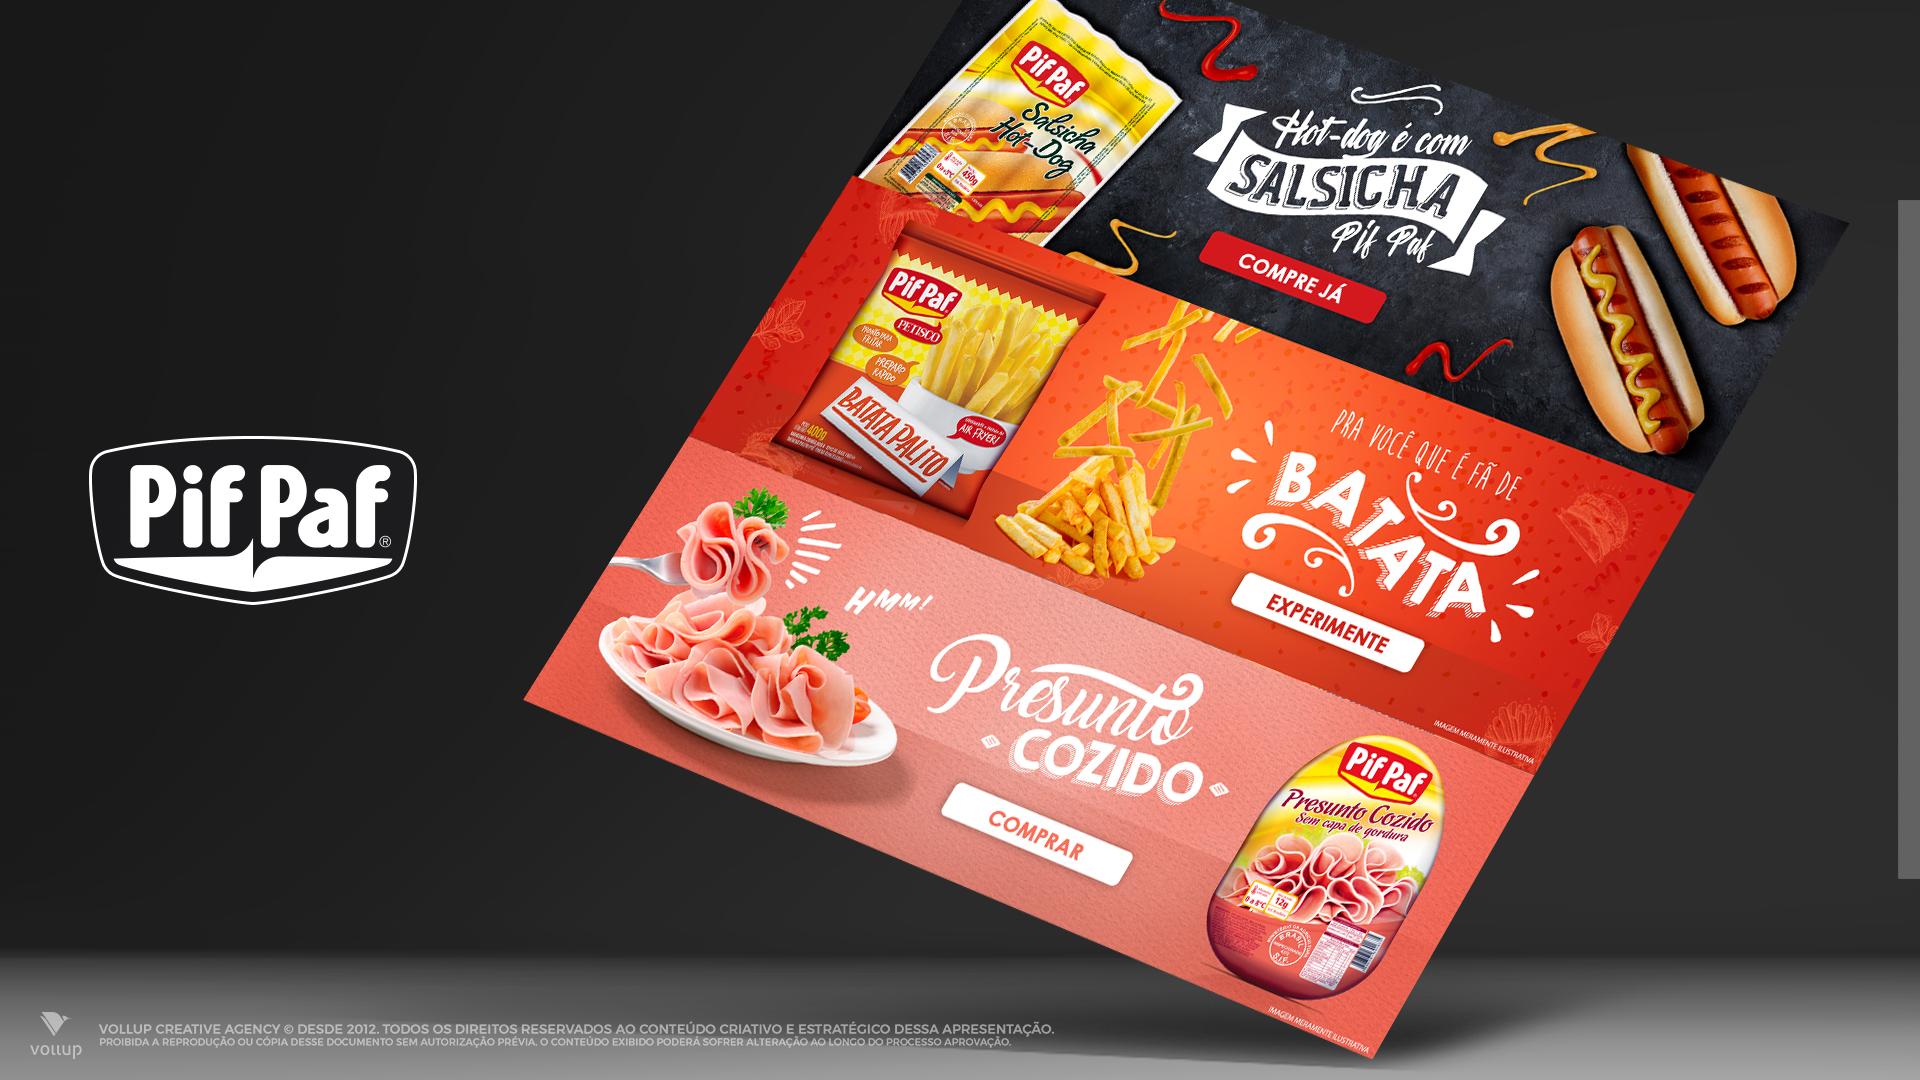 Banners promocionais Pif Paf